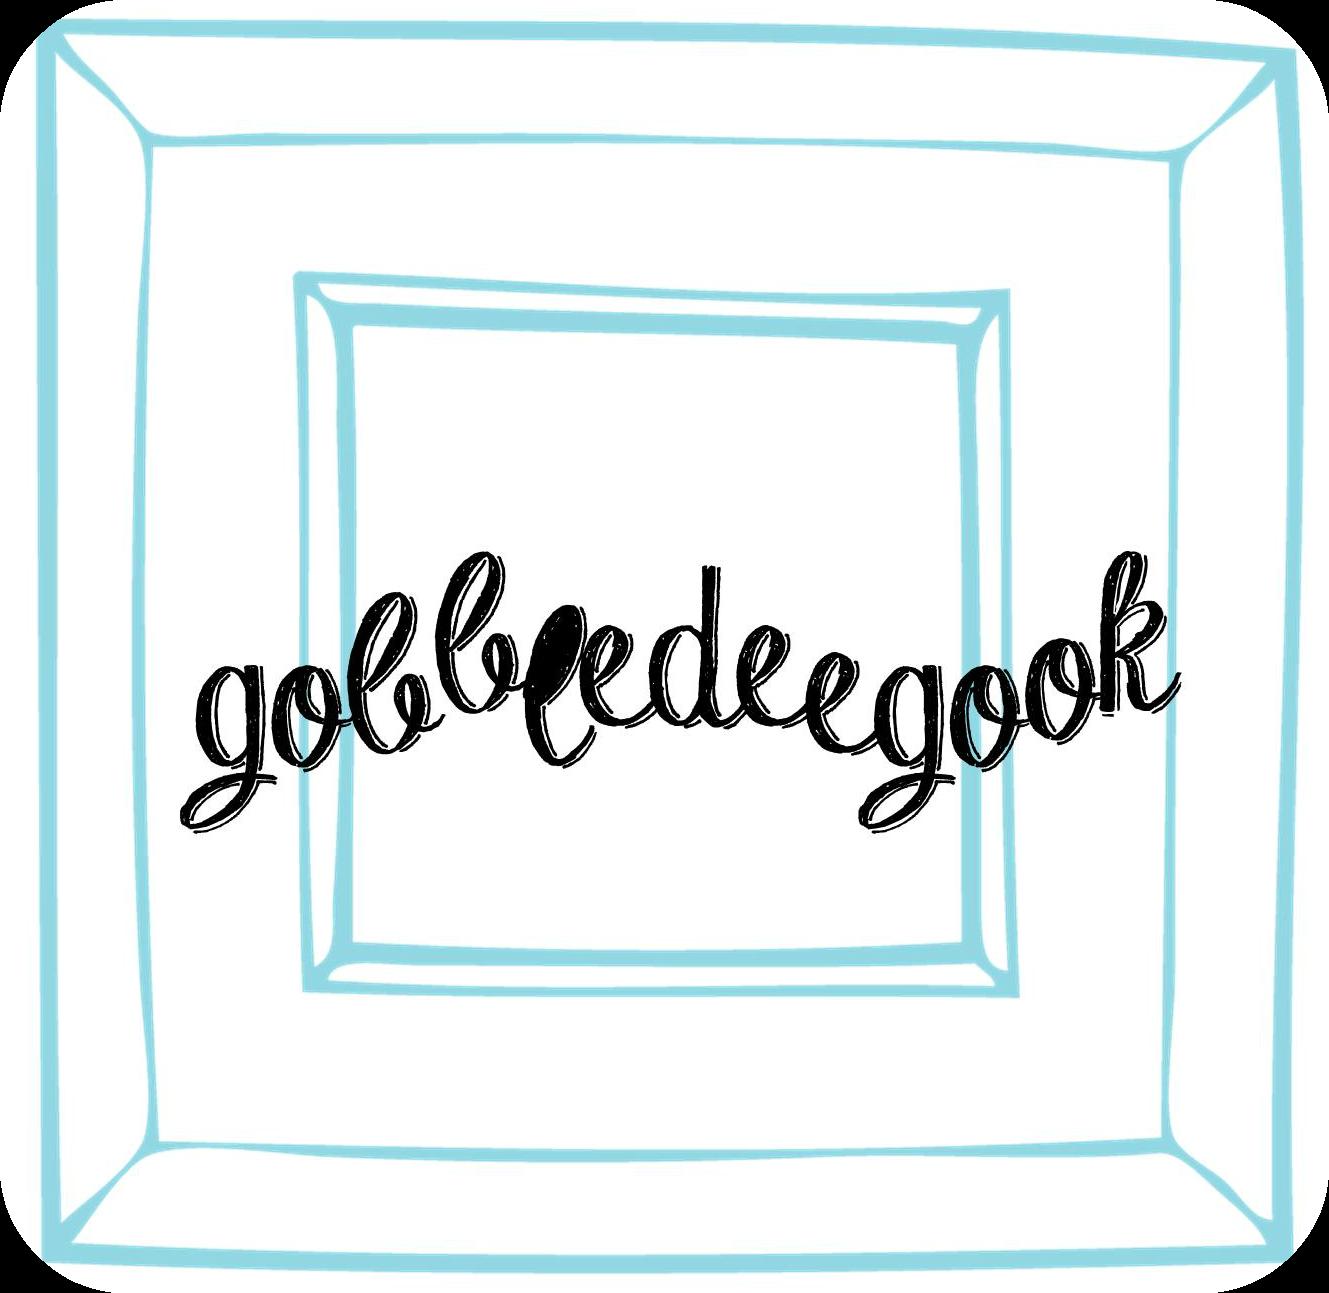 gobbledeegook